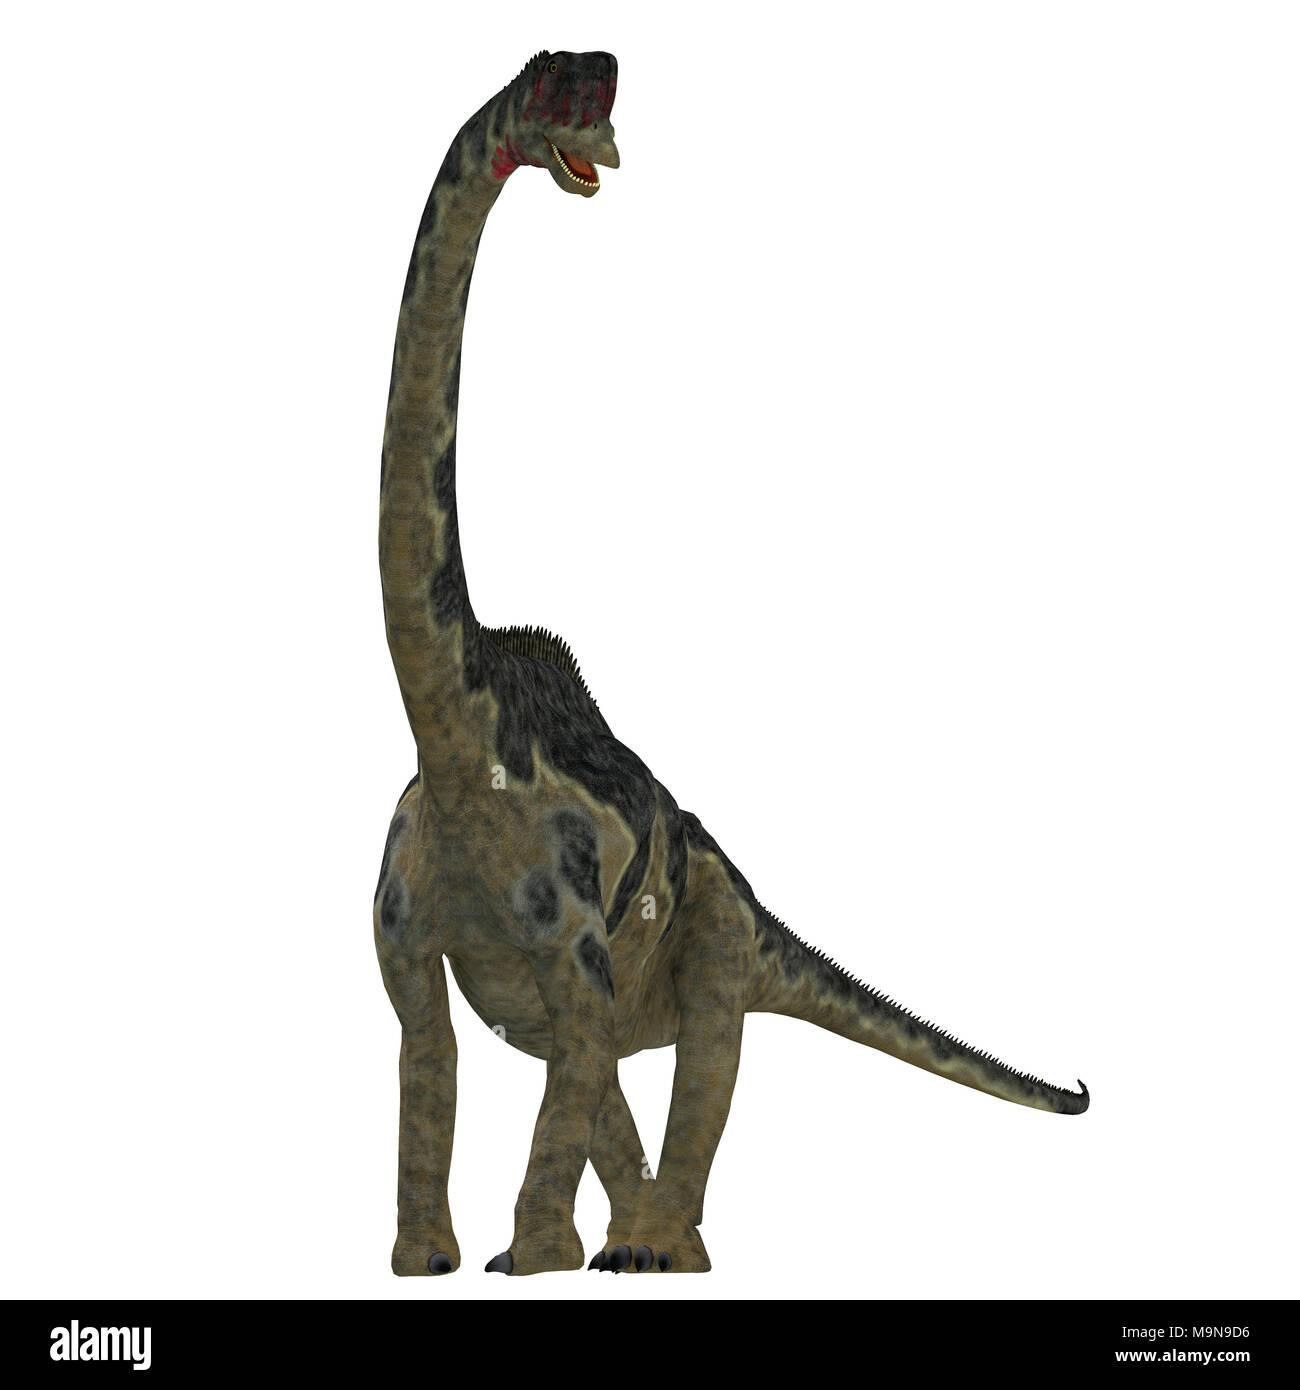 Europasaurus Dinosaur on White - Europasaurus was a sauropod herbivorous dinosaur that lived in Germany, Europe during the Jurassic Period. - Stock Image